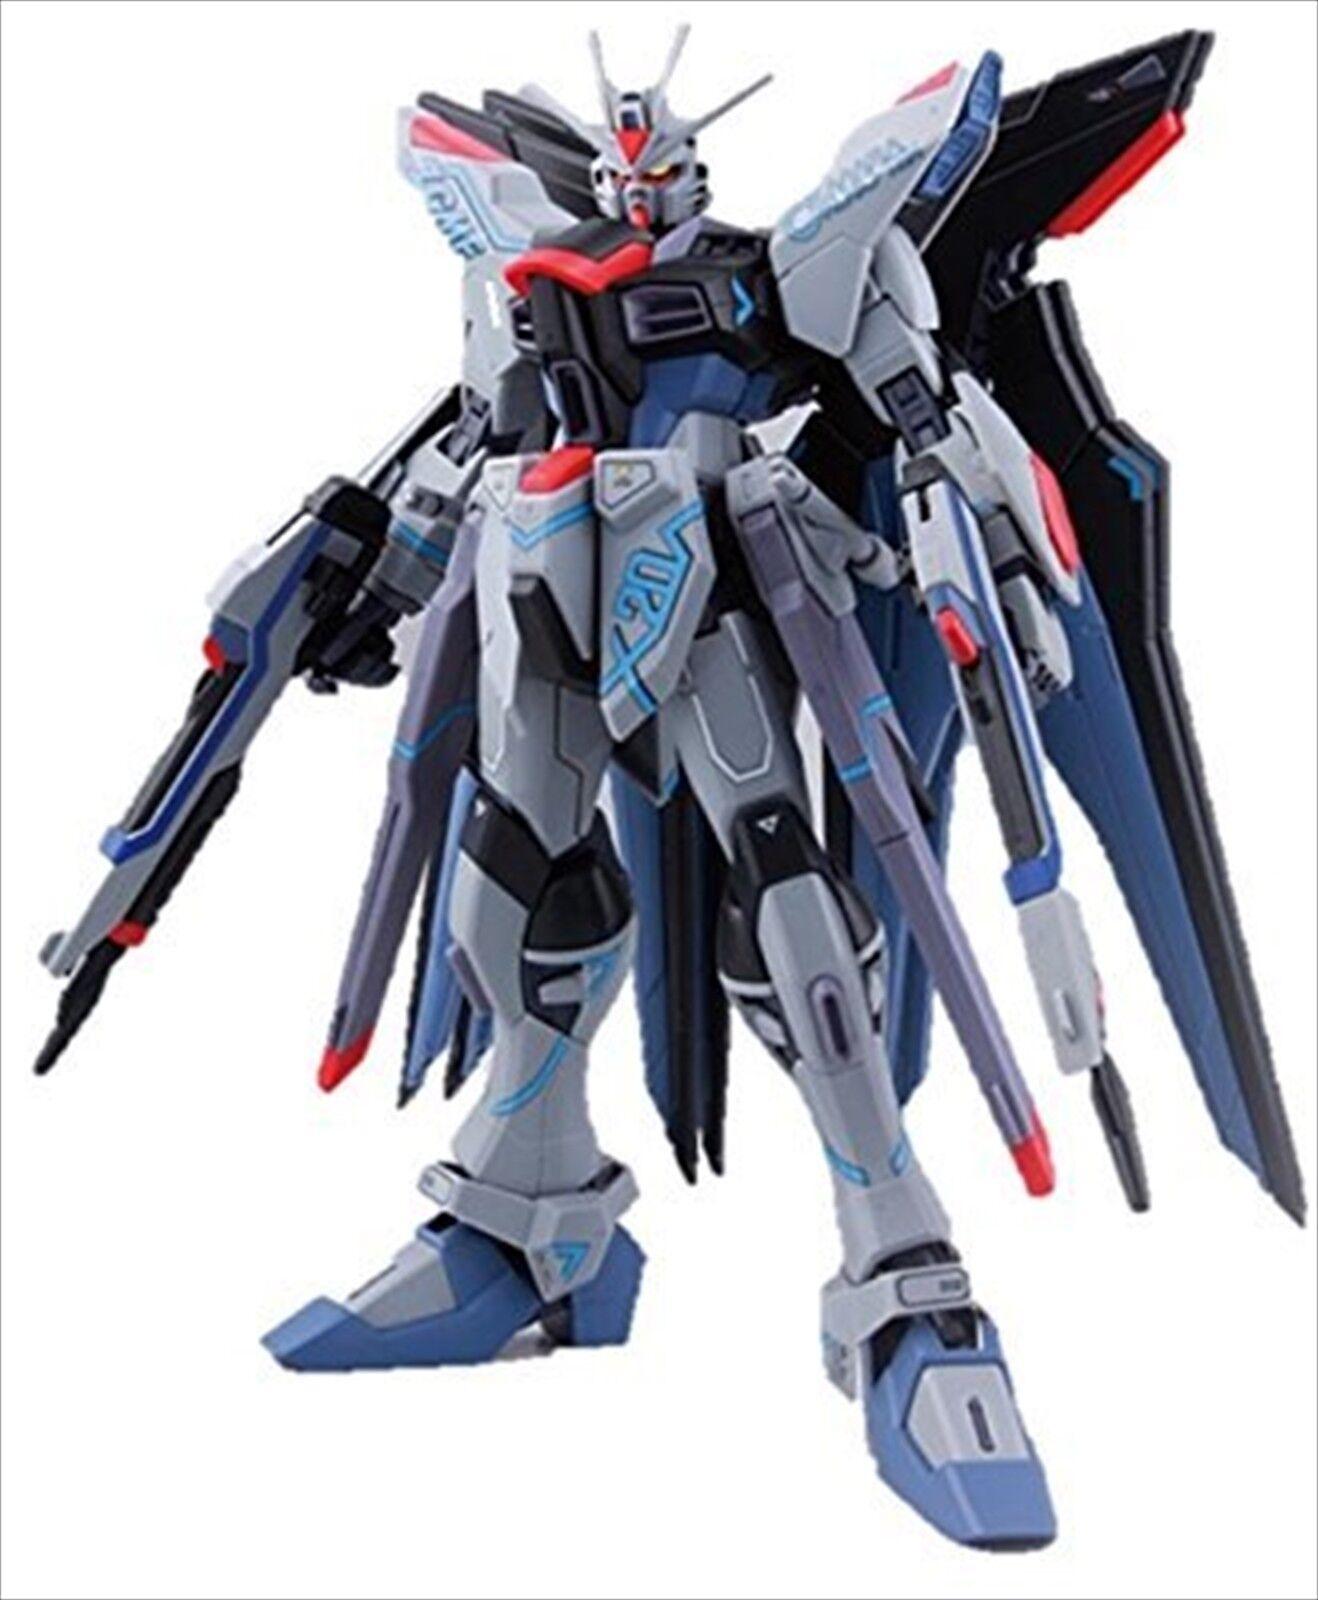 Bandai Bandai Bandai MG 1 100 Strike Freedom Gundam Kunio Okawara Exhibition Ver Model Kit 2c53e0